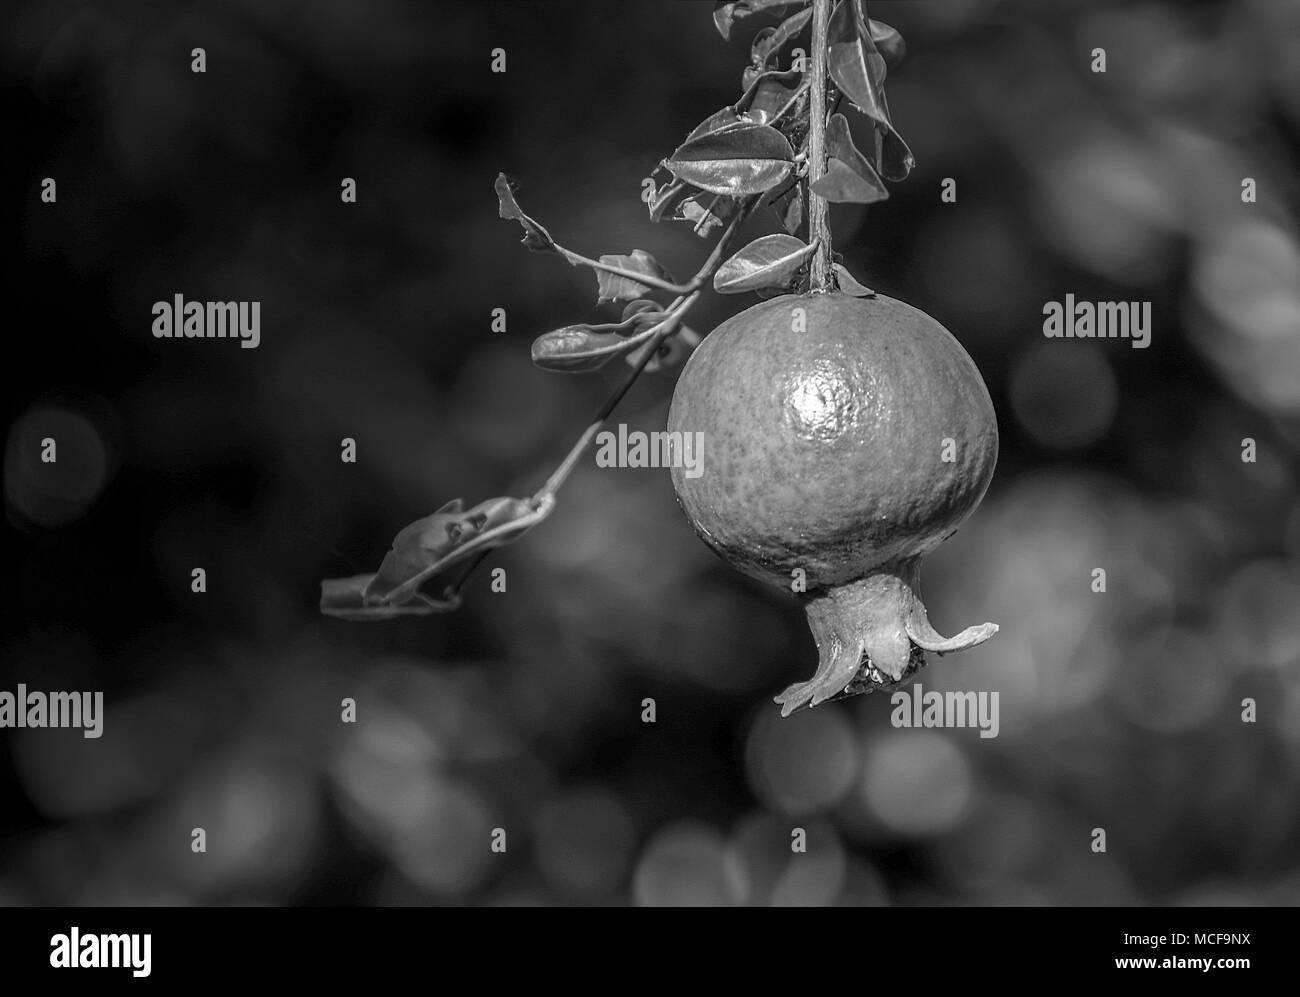 Unripe green pomegranate fruit. Monochrome photo, blurred background. - Stock Image